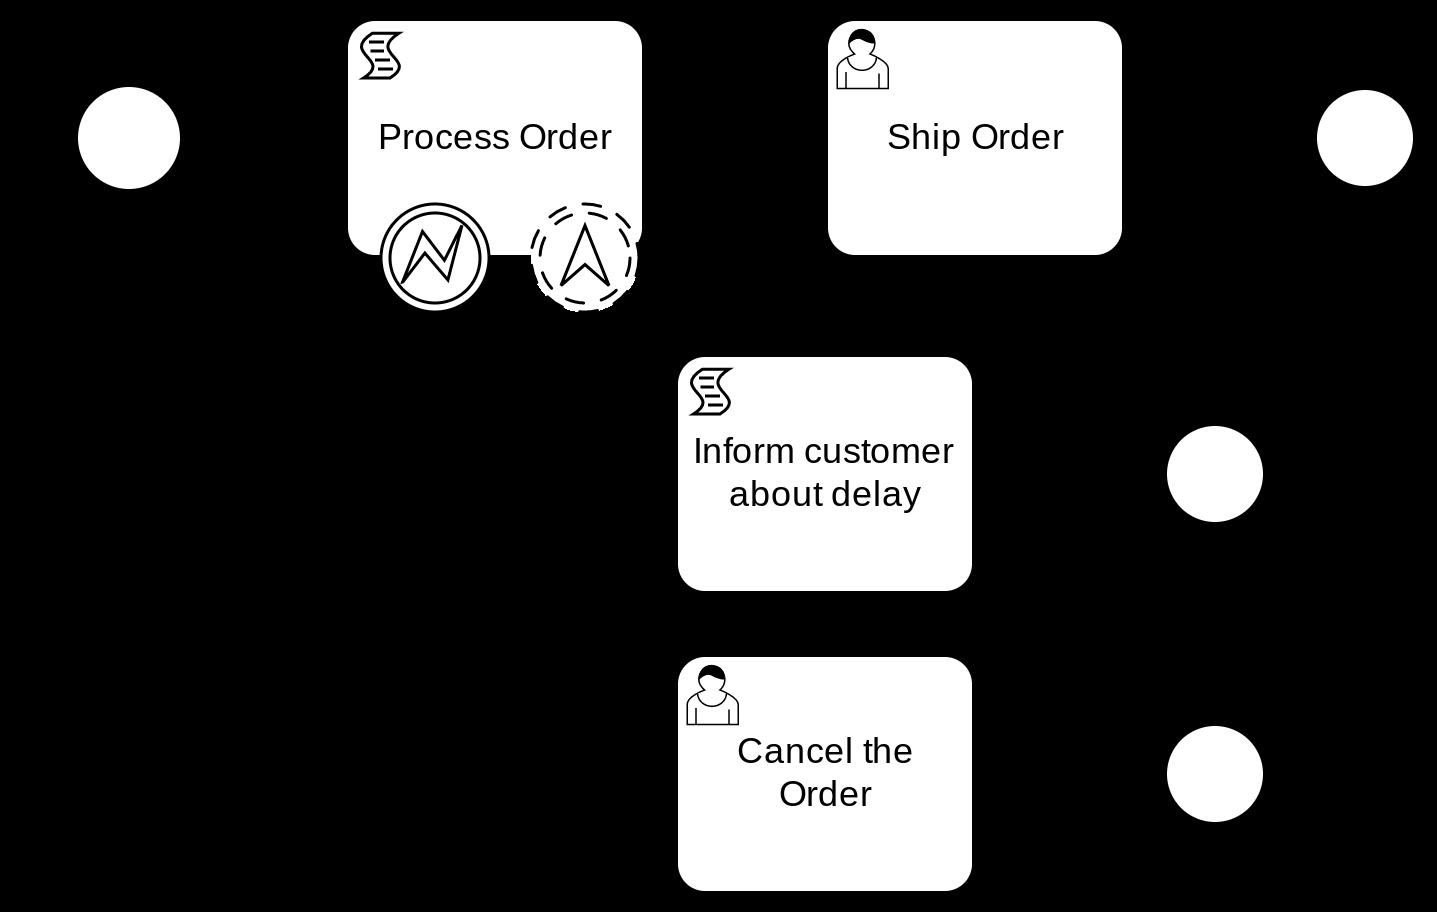 BPMN Order Process